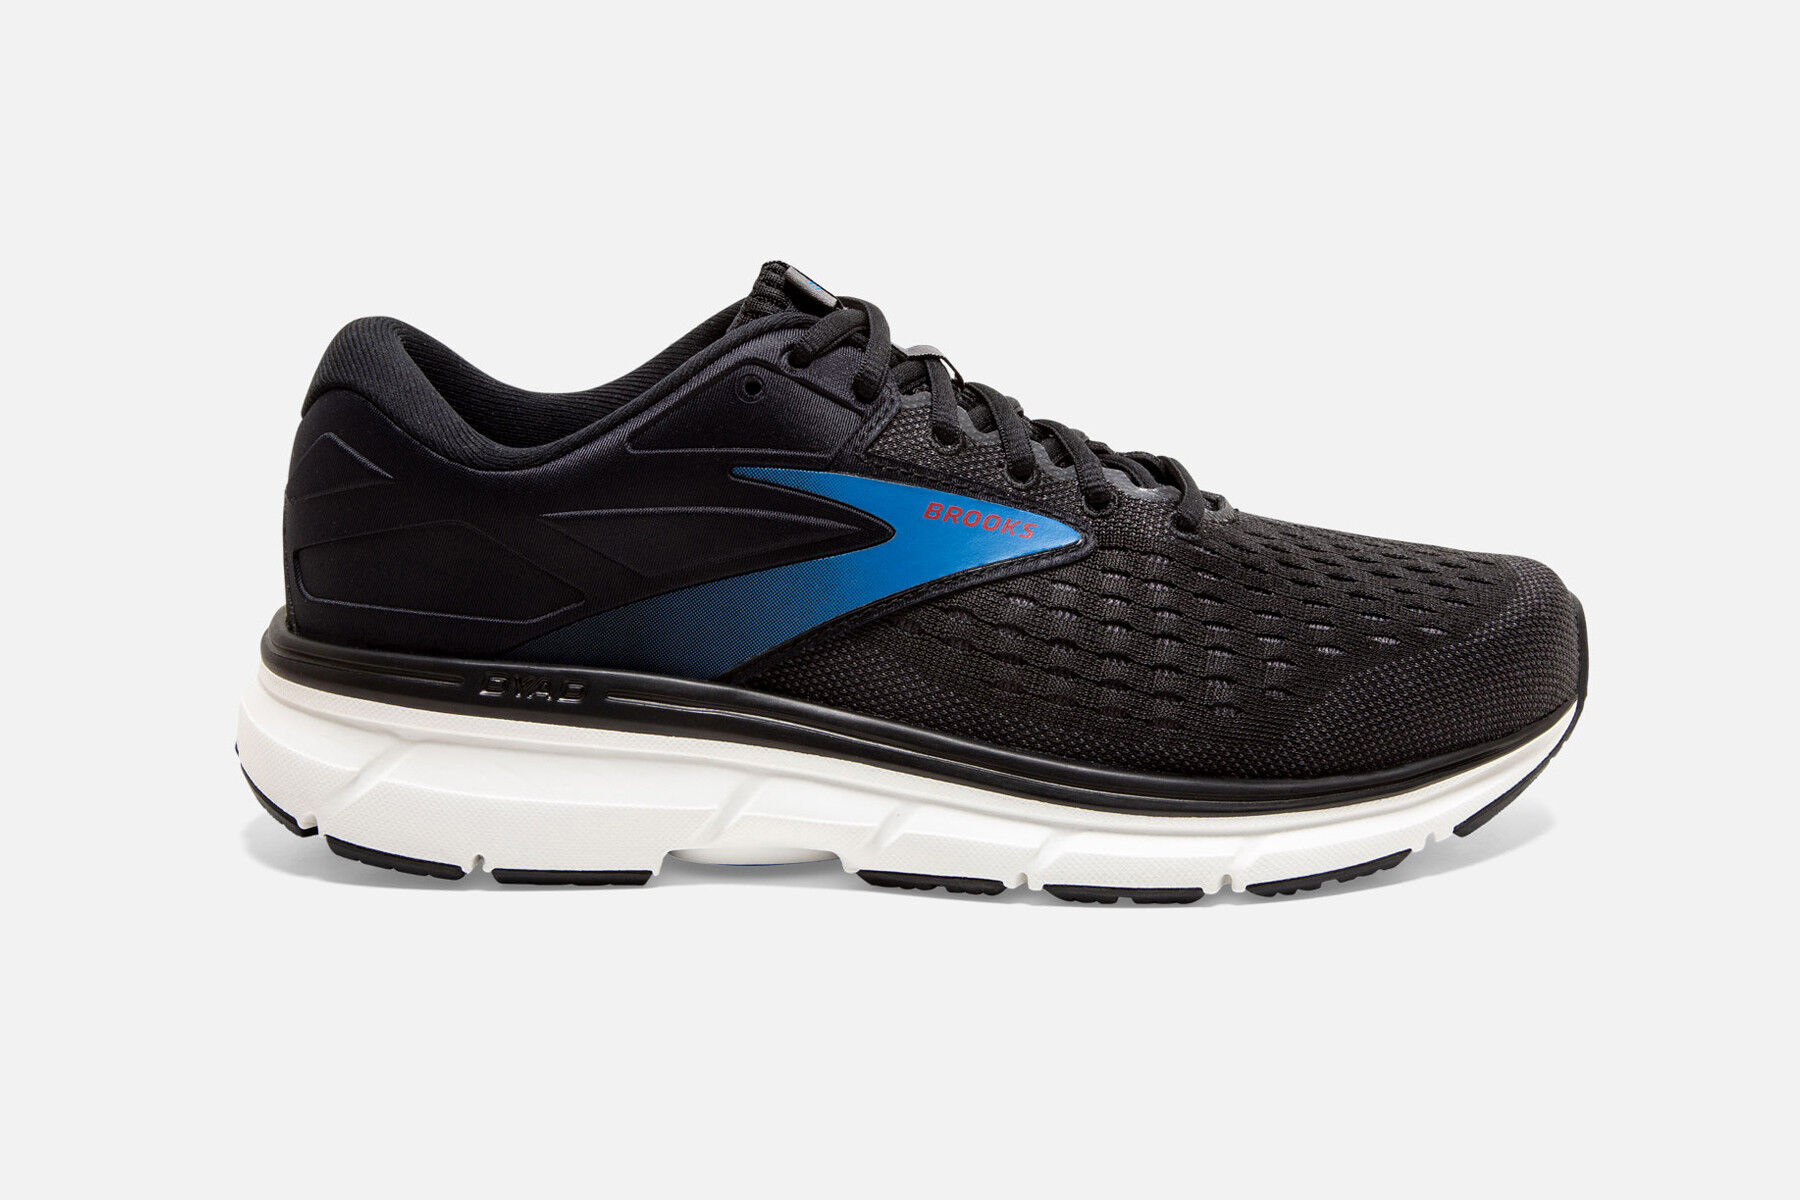 Dyad 11 | Men's Road Running Shoes